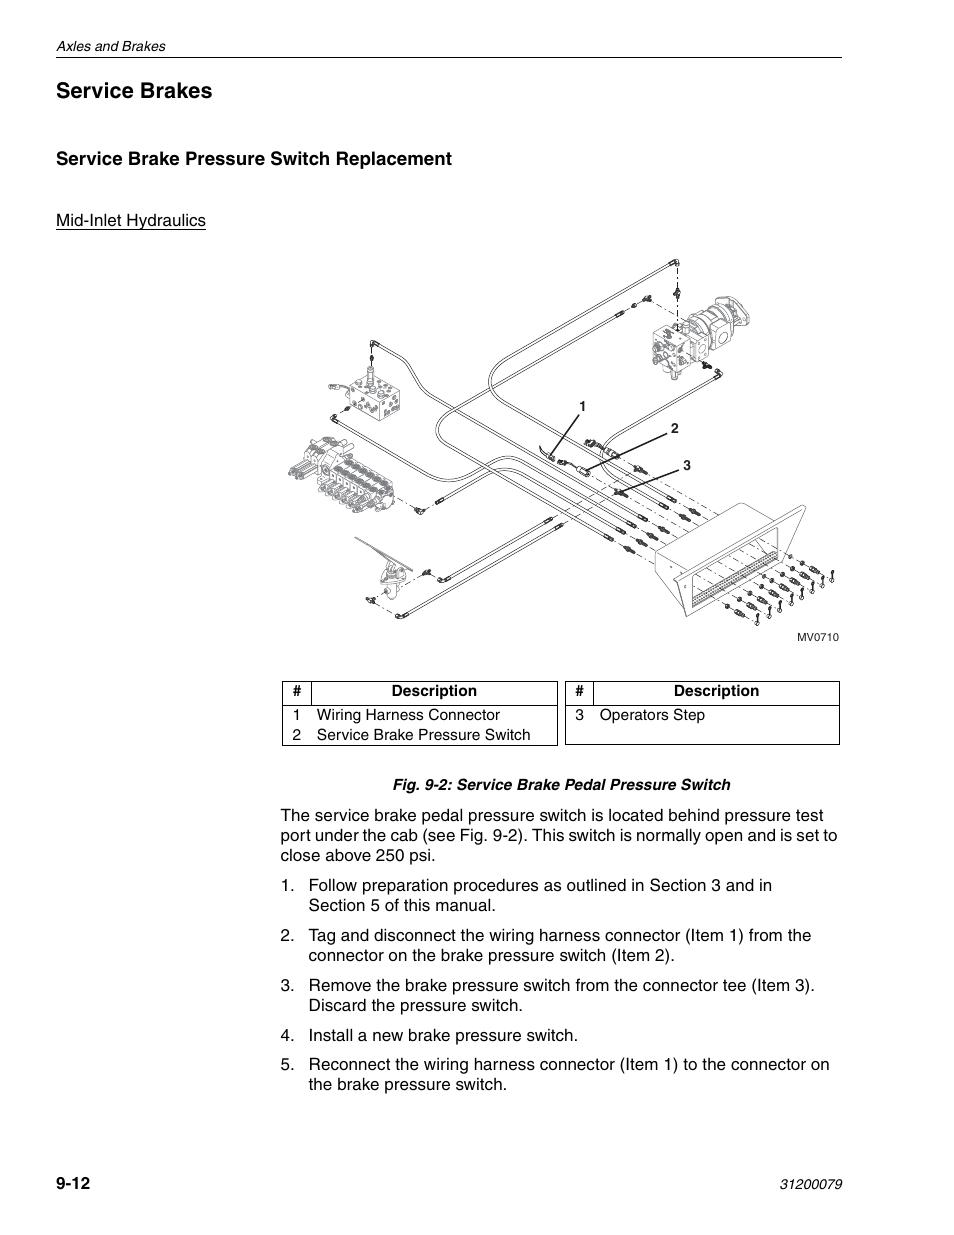 Service brakes | Lull 1044C-54 Series II Service Manual User Manual | Page  356 / 382